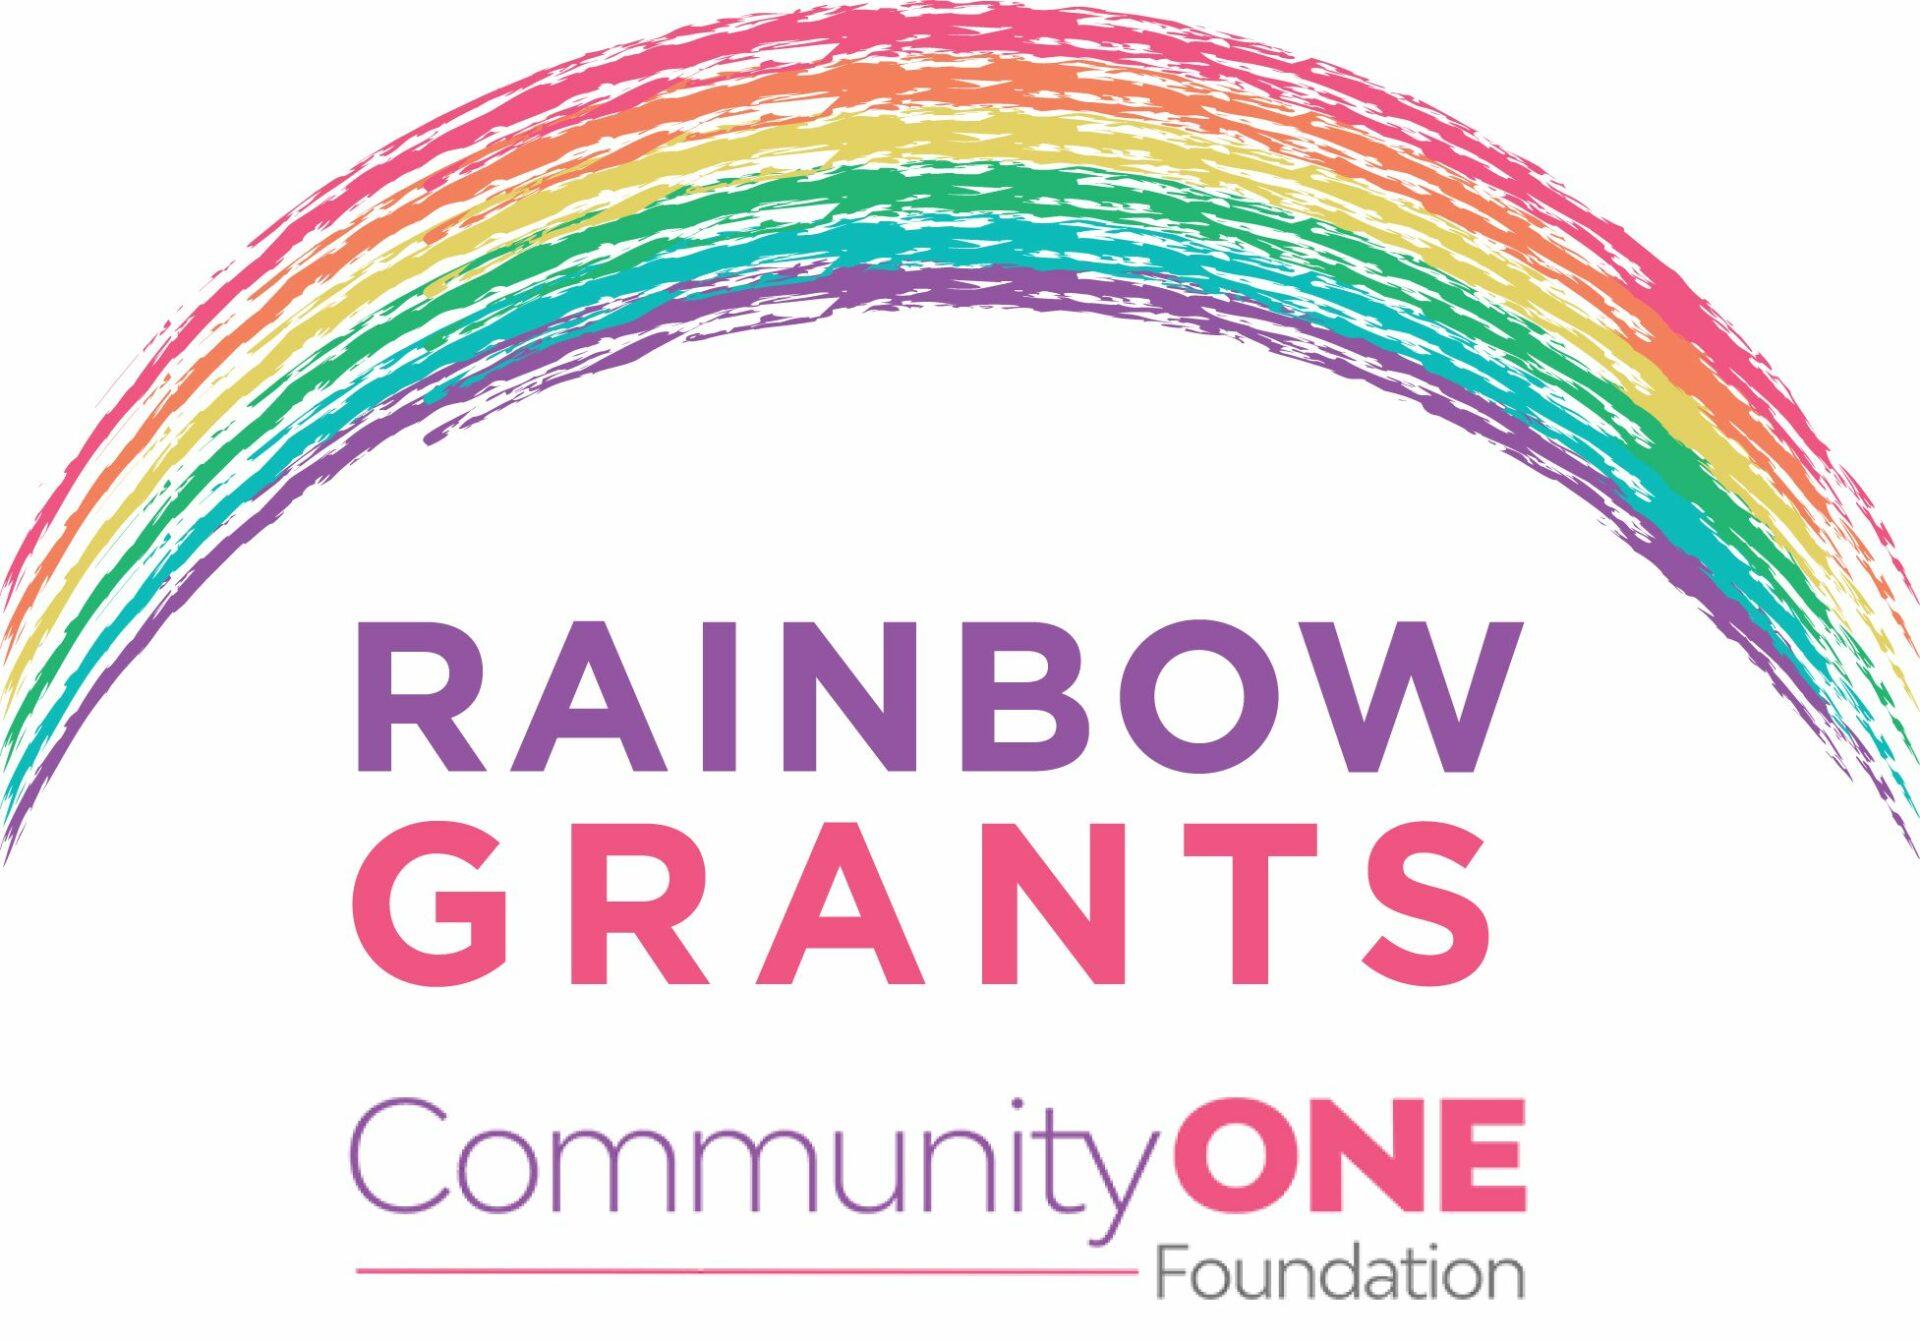 Text: Rainbow Grants, Community One Foundation